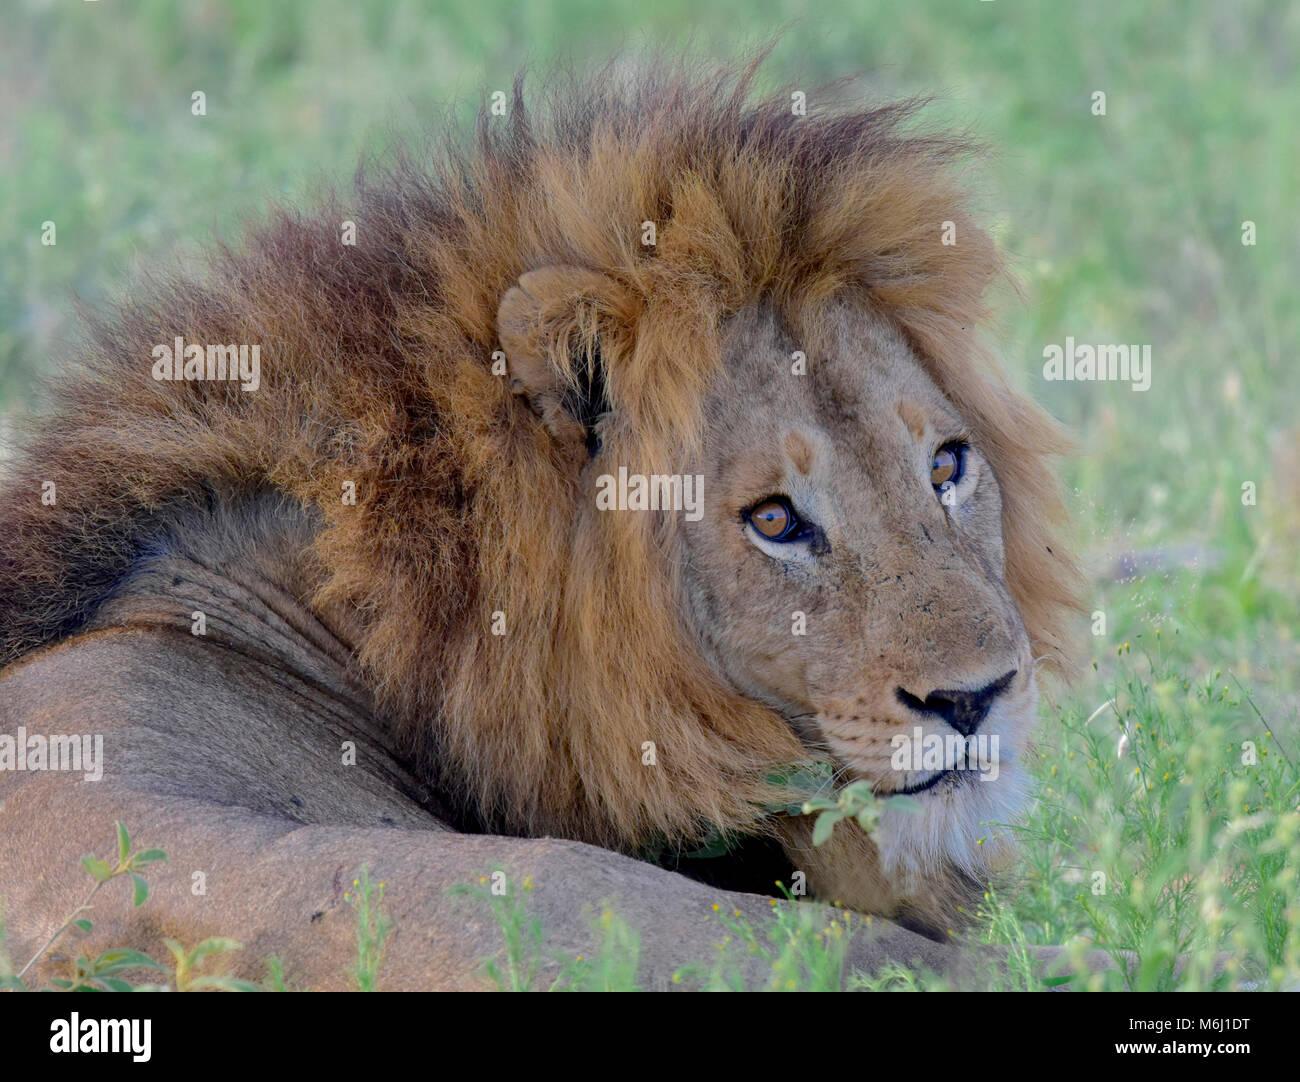 Parque Nacional Kruger, Sudáfrica. Un paraíso de aves y vida silvestre. Impresionante aguarï retrato de león Foto de stock